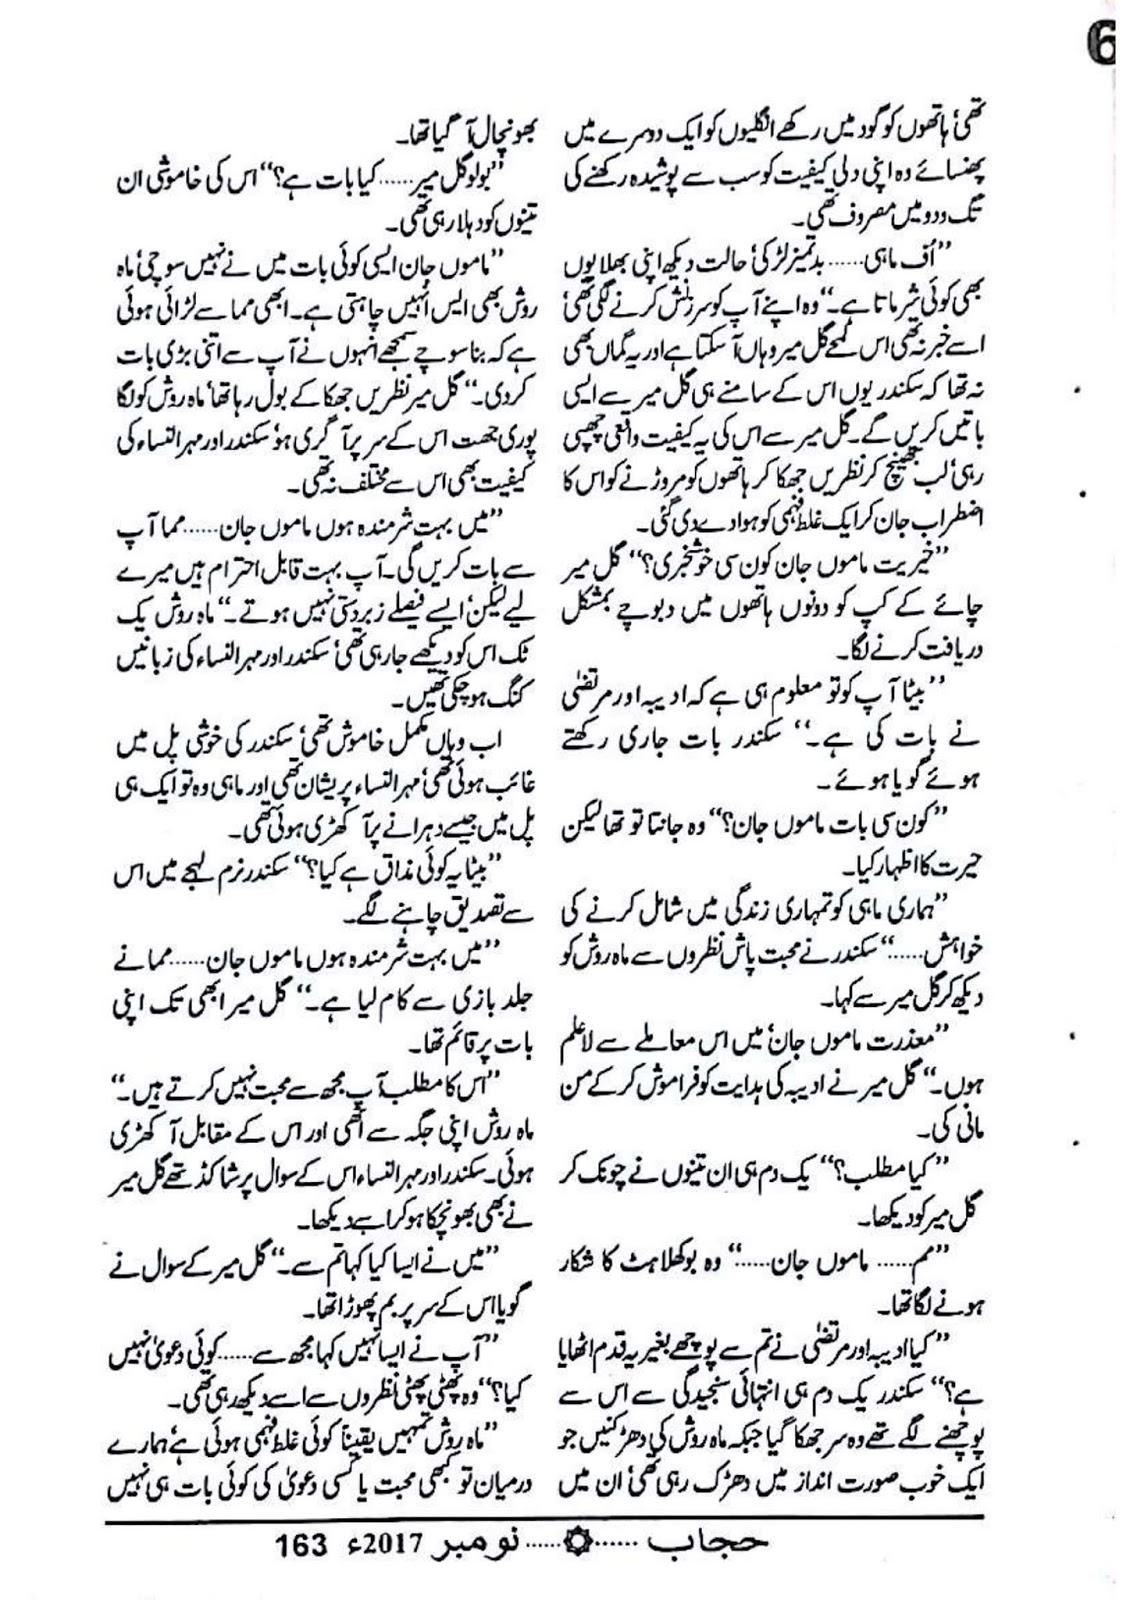 prime online novels mohabbat meri aakhri shararat thi by saima Sathya Sai Maa mohabbat meri aakhri shararat thi by saima qureshi plete last part